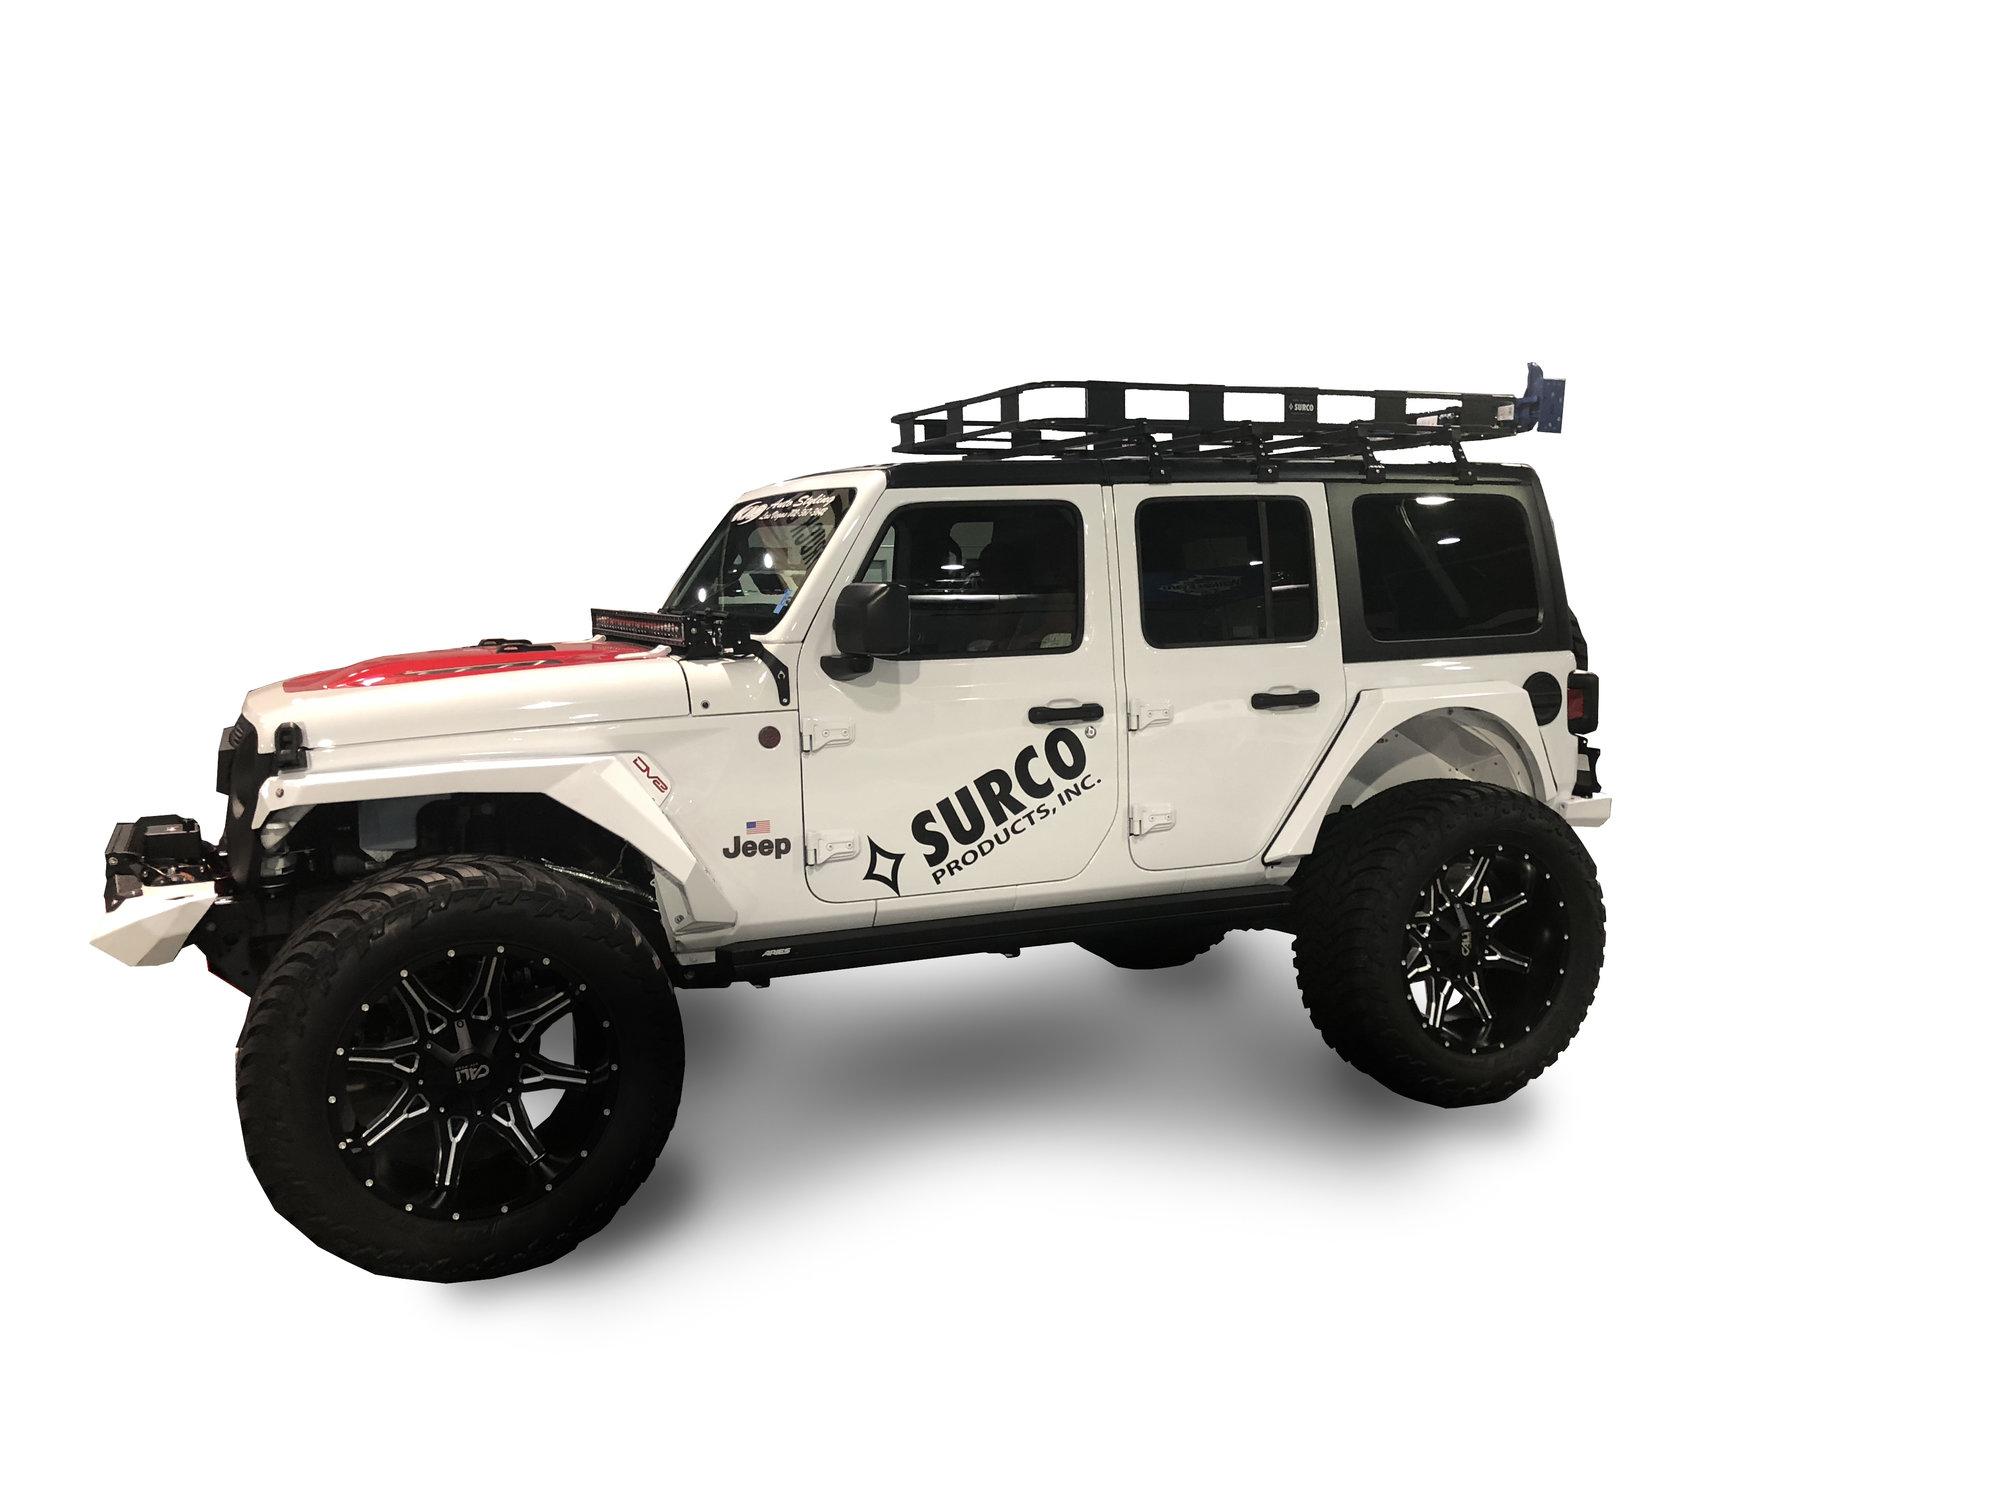 surco safari hardtop rack for 18 20 jeep wrangler jl unlimited